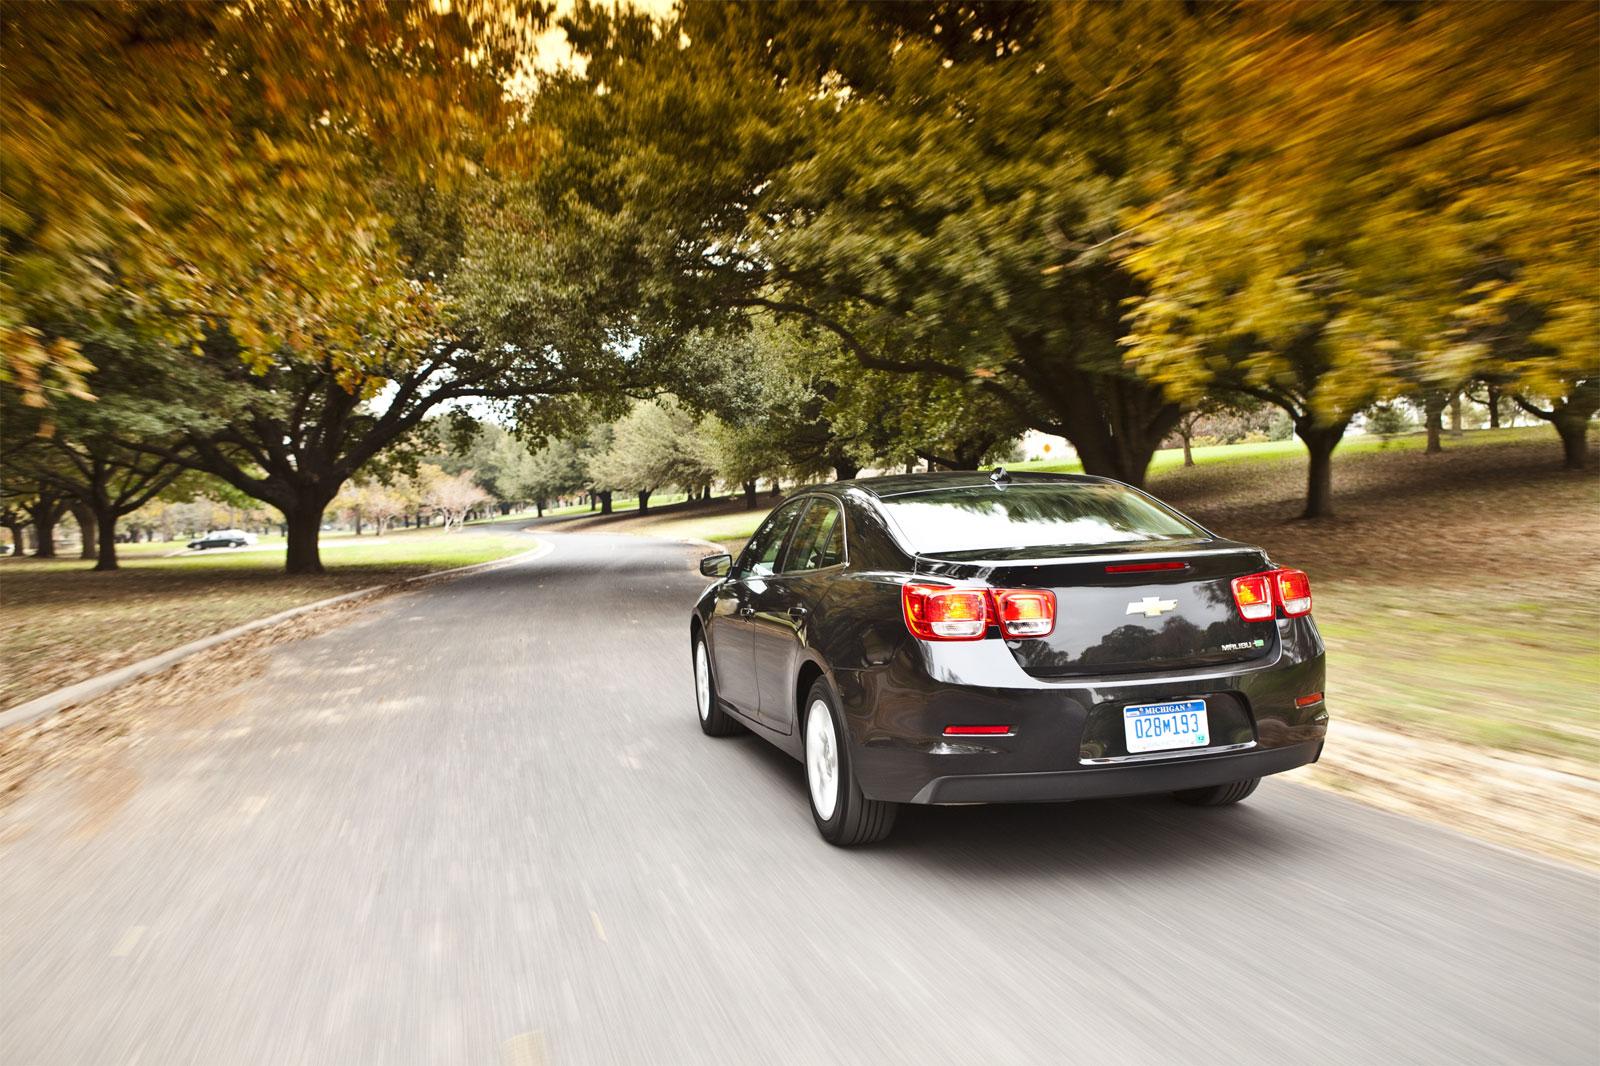 http://1.bp.blogspot.com/-tRK1W0foyrc/T-sN47BARcI/AAAAAAAAD9g/d8gUE1Gy9Gc/s1600/Chevrolet+Malibu+Eco+Hd+Wallpapers+2013_1.jpg